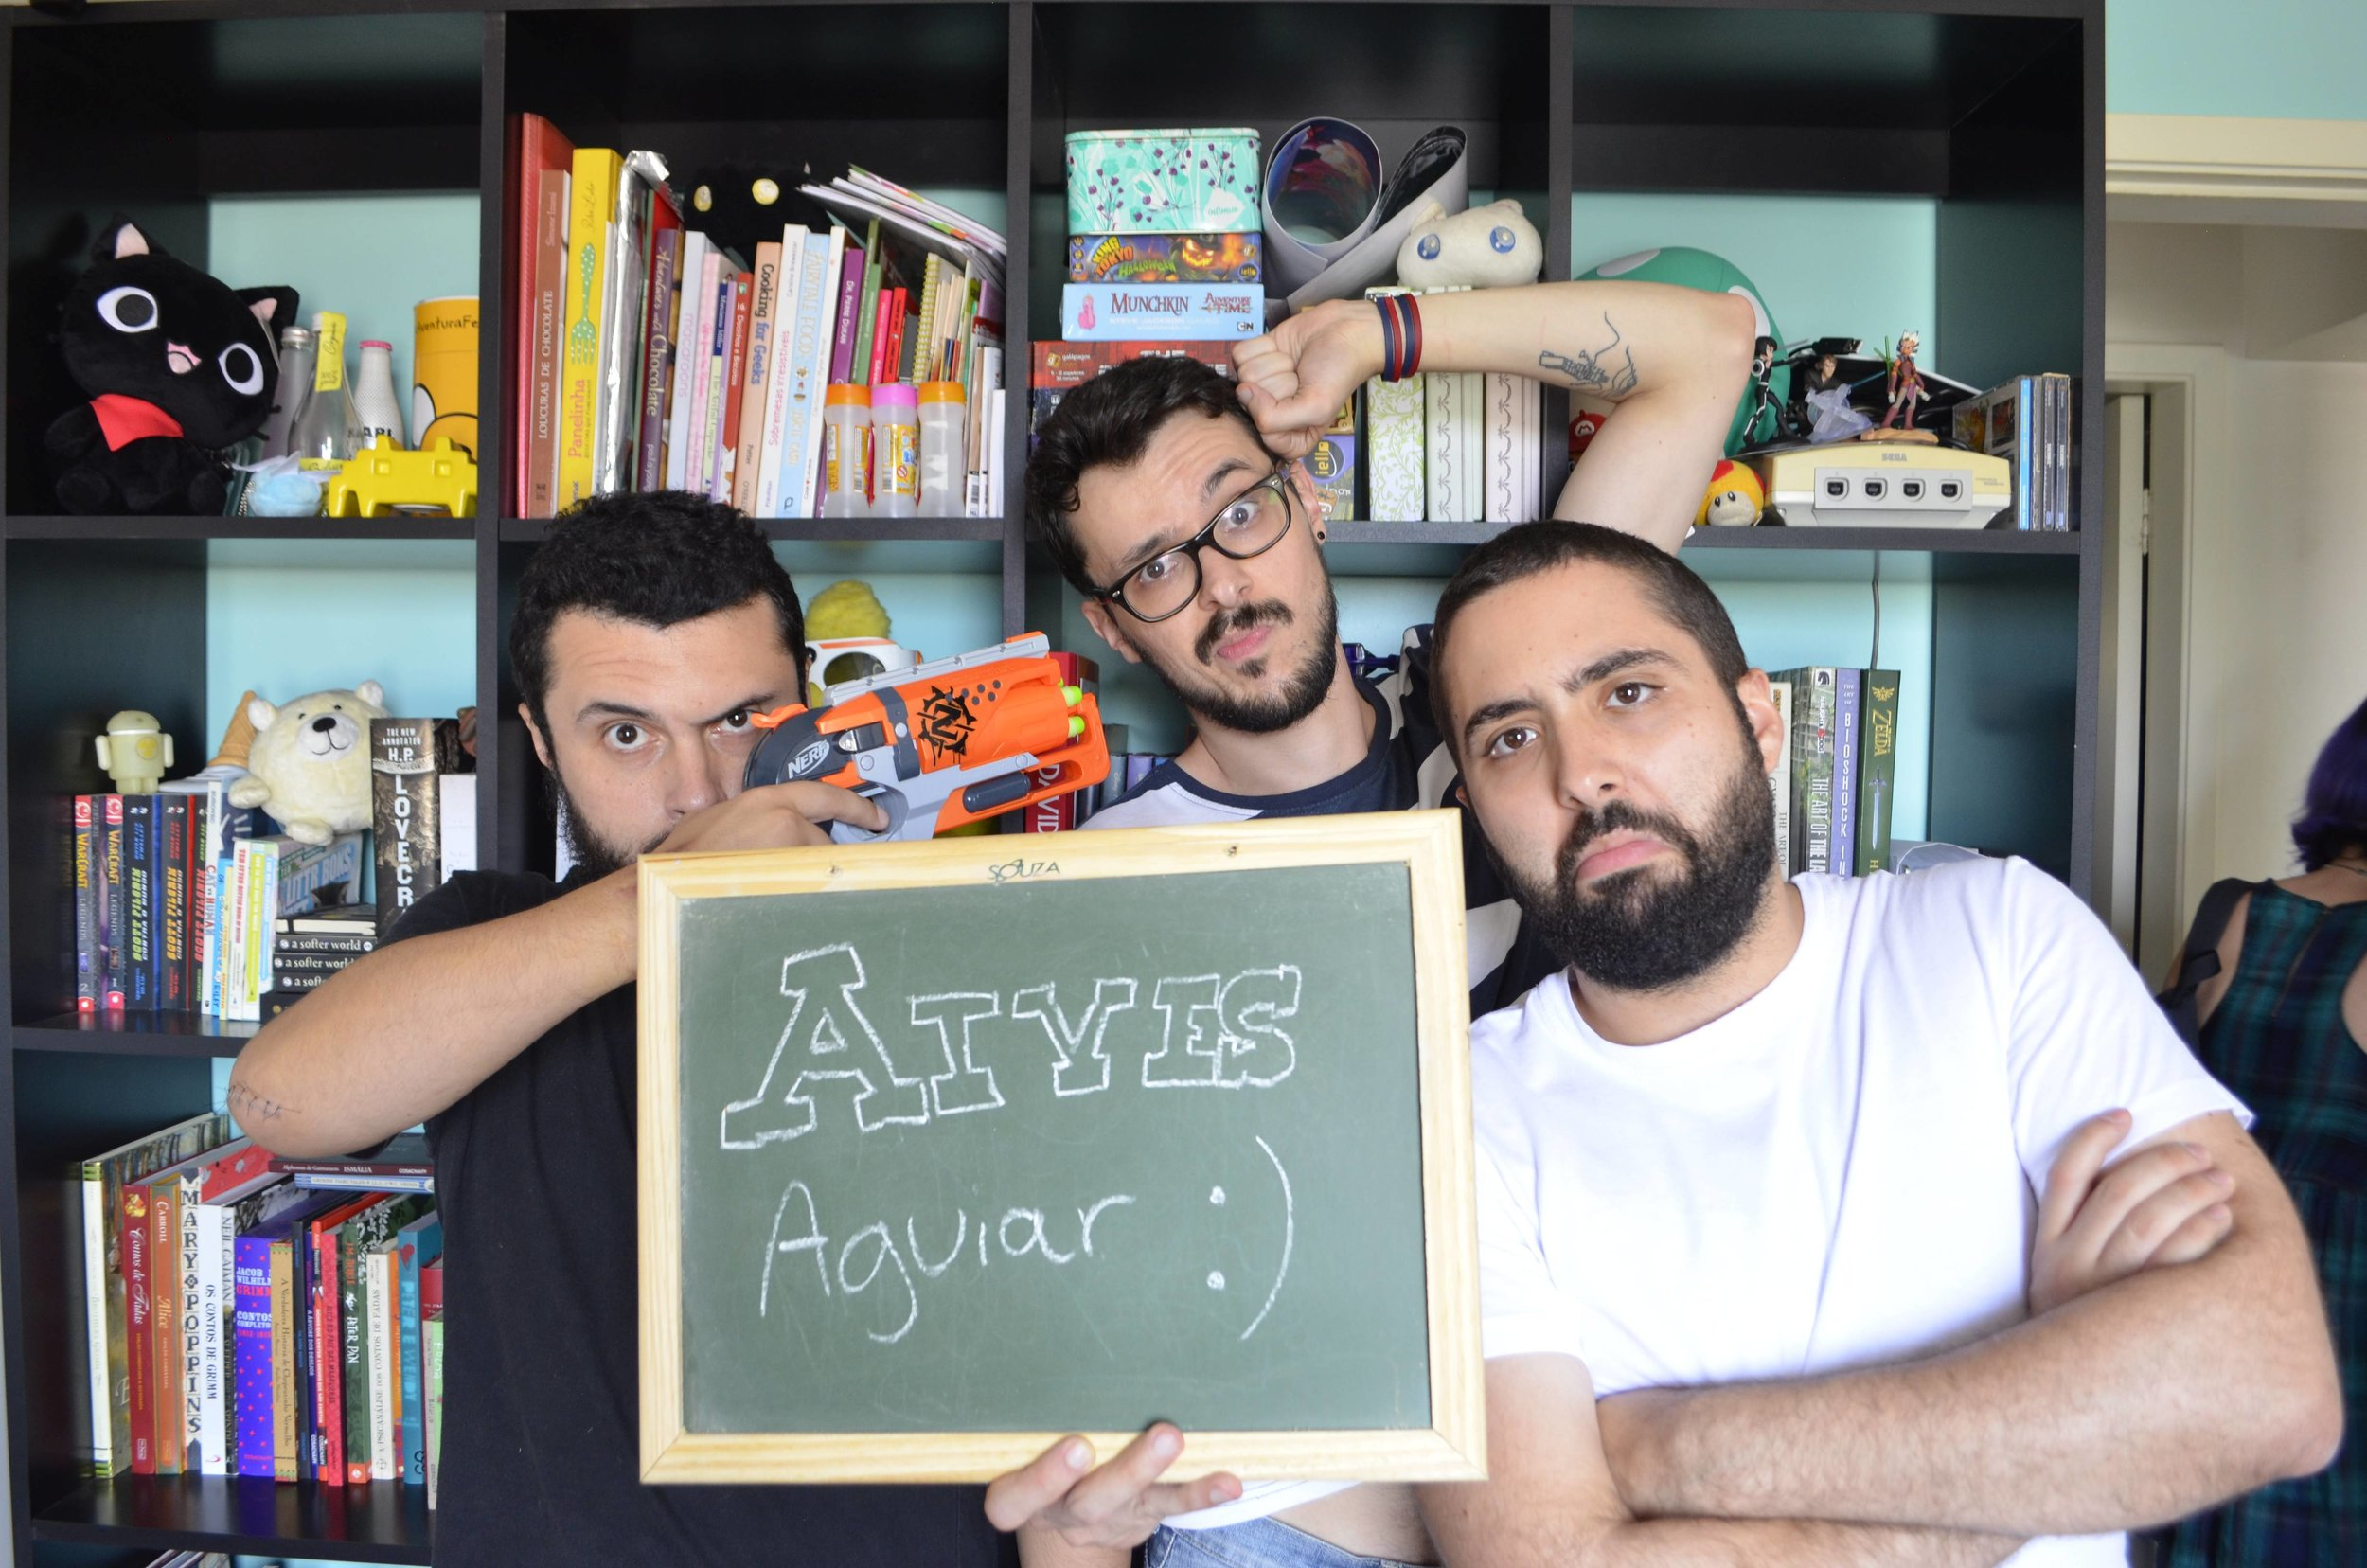 Ives-Aguiar.jpg